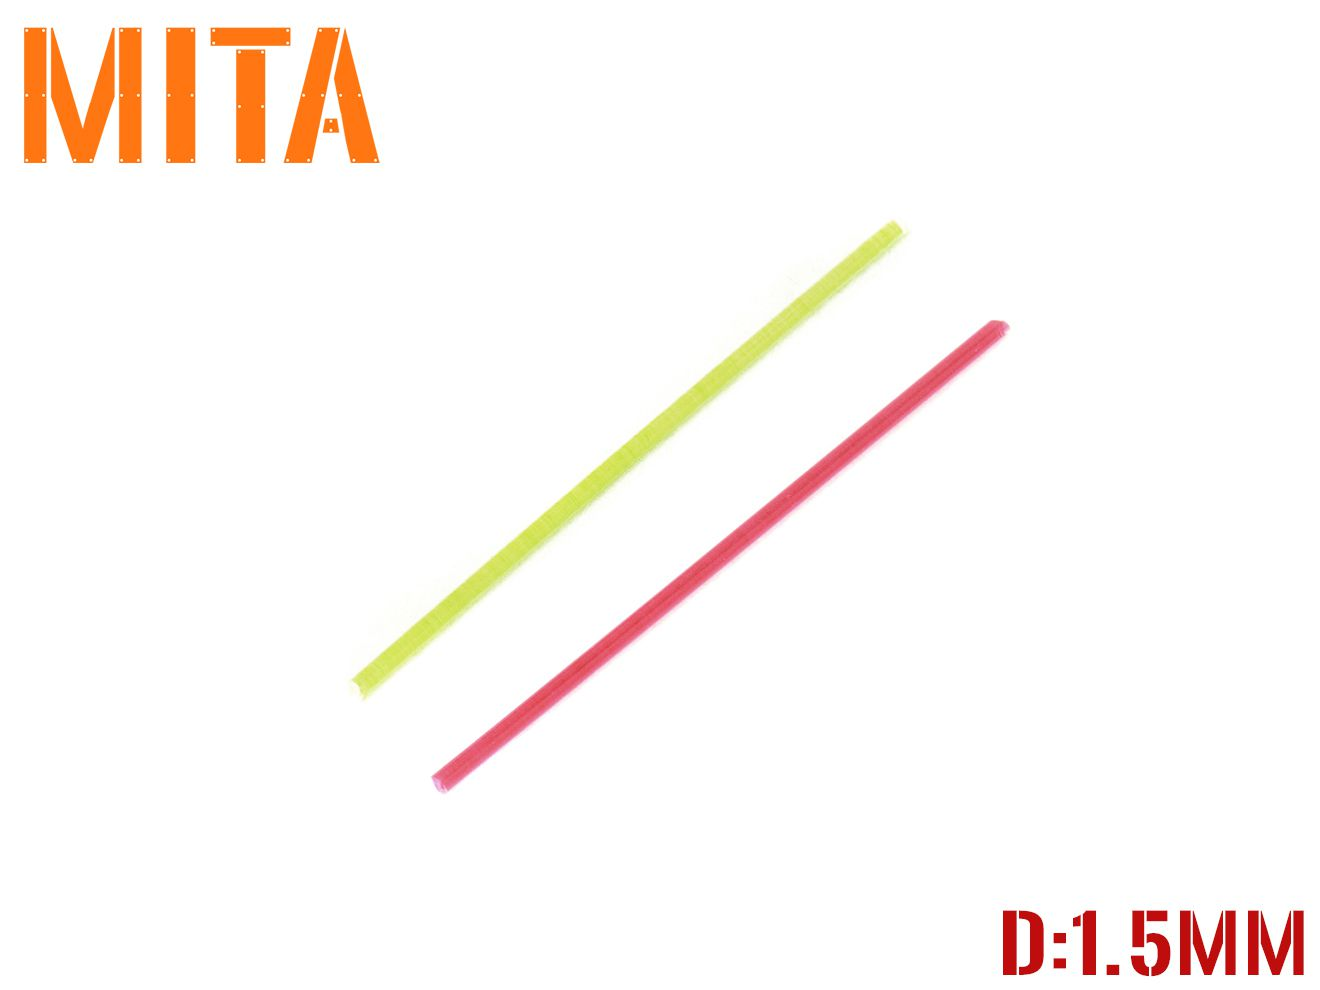 MITA M.I.T.AIRSOFT ドットサイト ファイバーサイト マイクロファイバー GLOCK お金を節約 G17 G18C G22 G34 Hi-CAPA ハイキャパ M1911A1 MEU 視認性アップ M9A1 補修用ファイバー グリーンレッド 1.5mm 修理 HK45 ガンサイト用 ファイバーオプティック 交換 アウトレット☆送料無料 直径1.5ミリ MP9 WEKJ 集光サイト